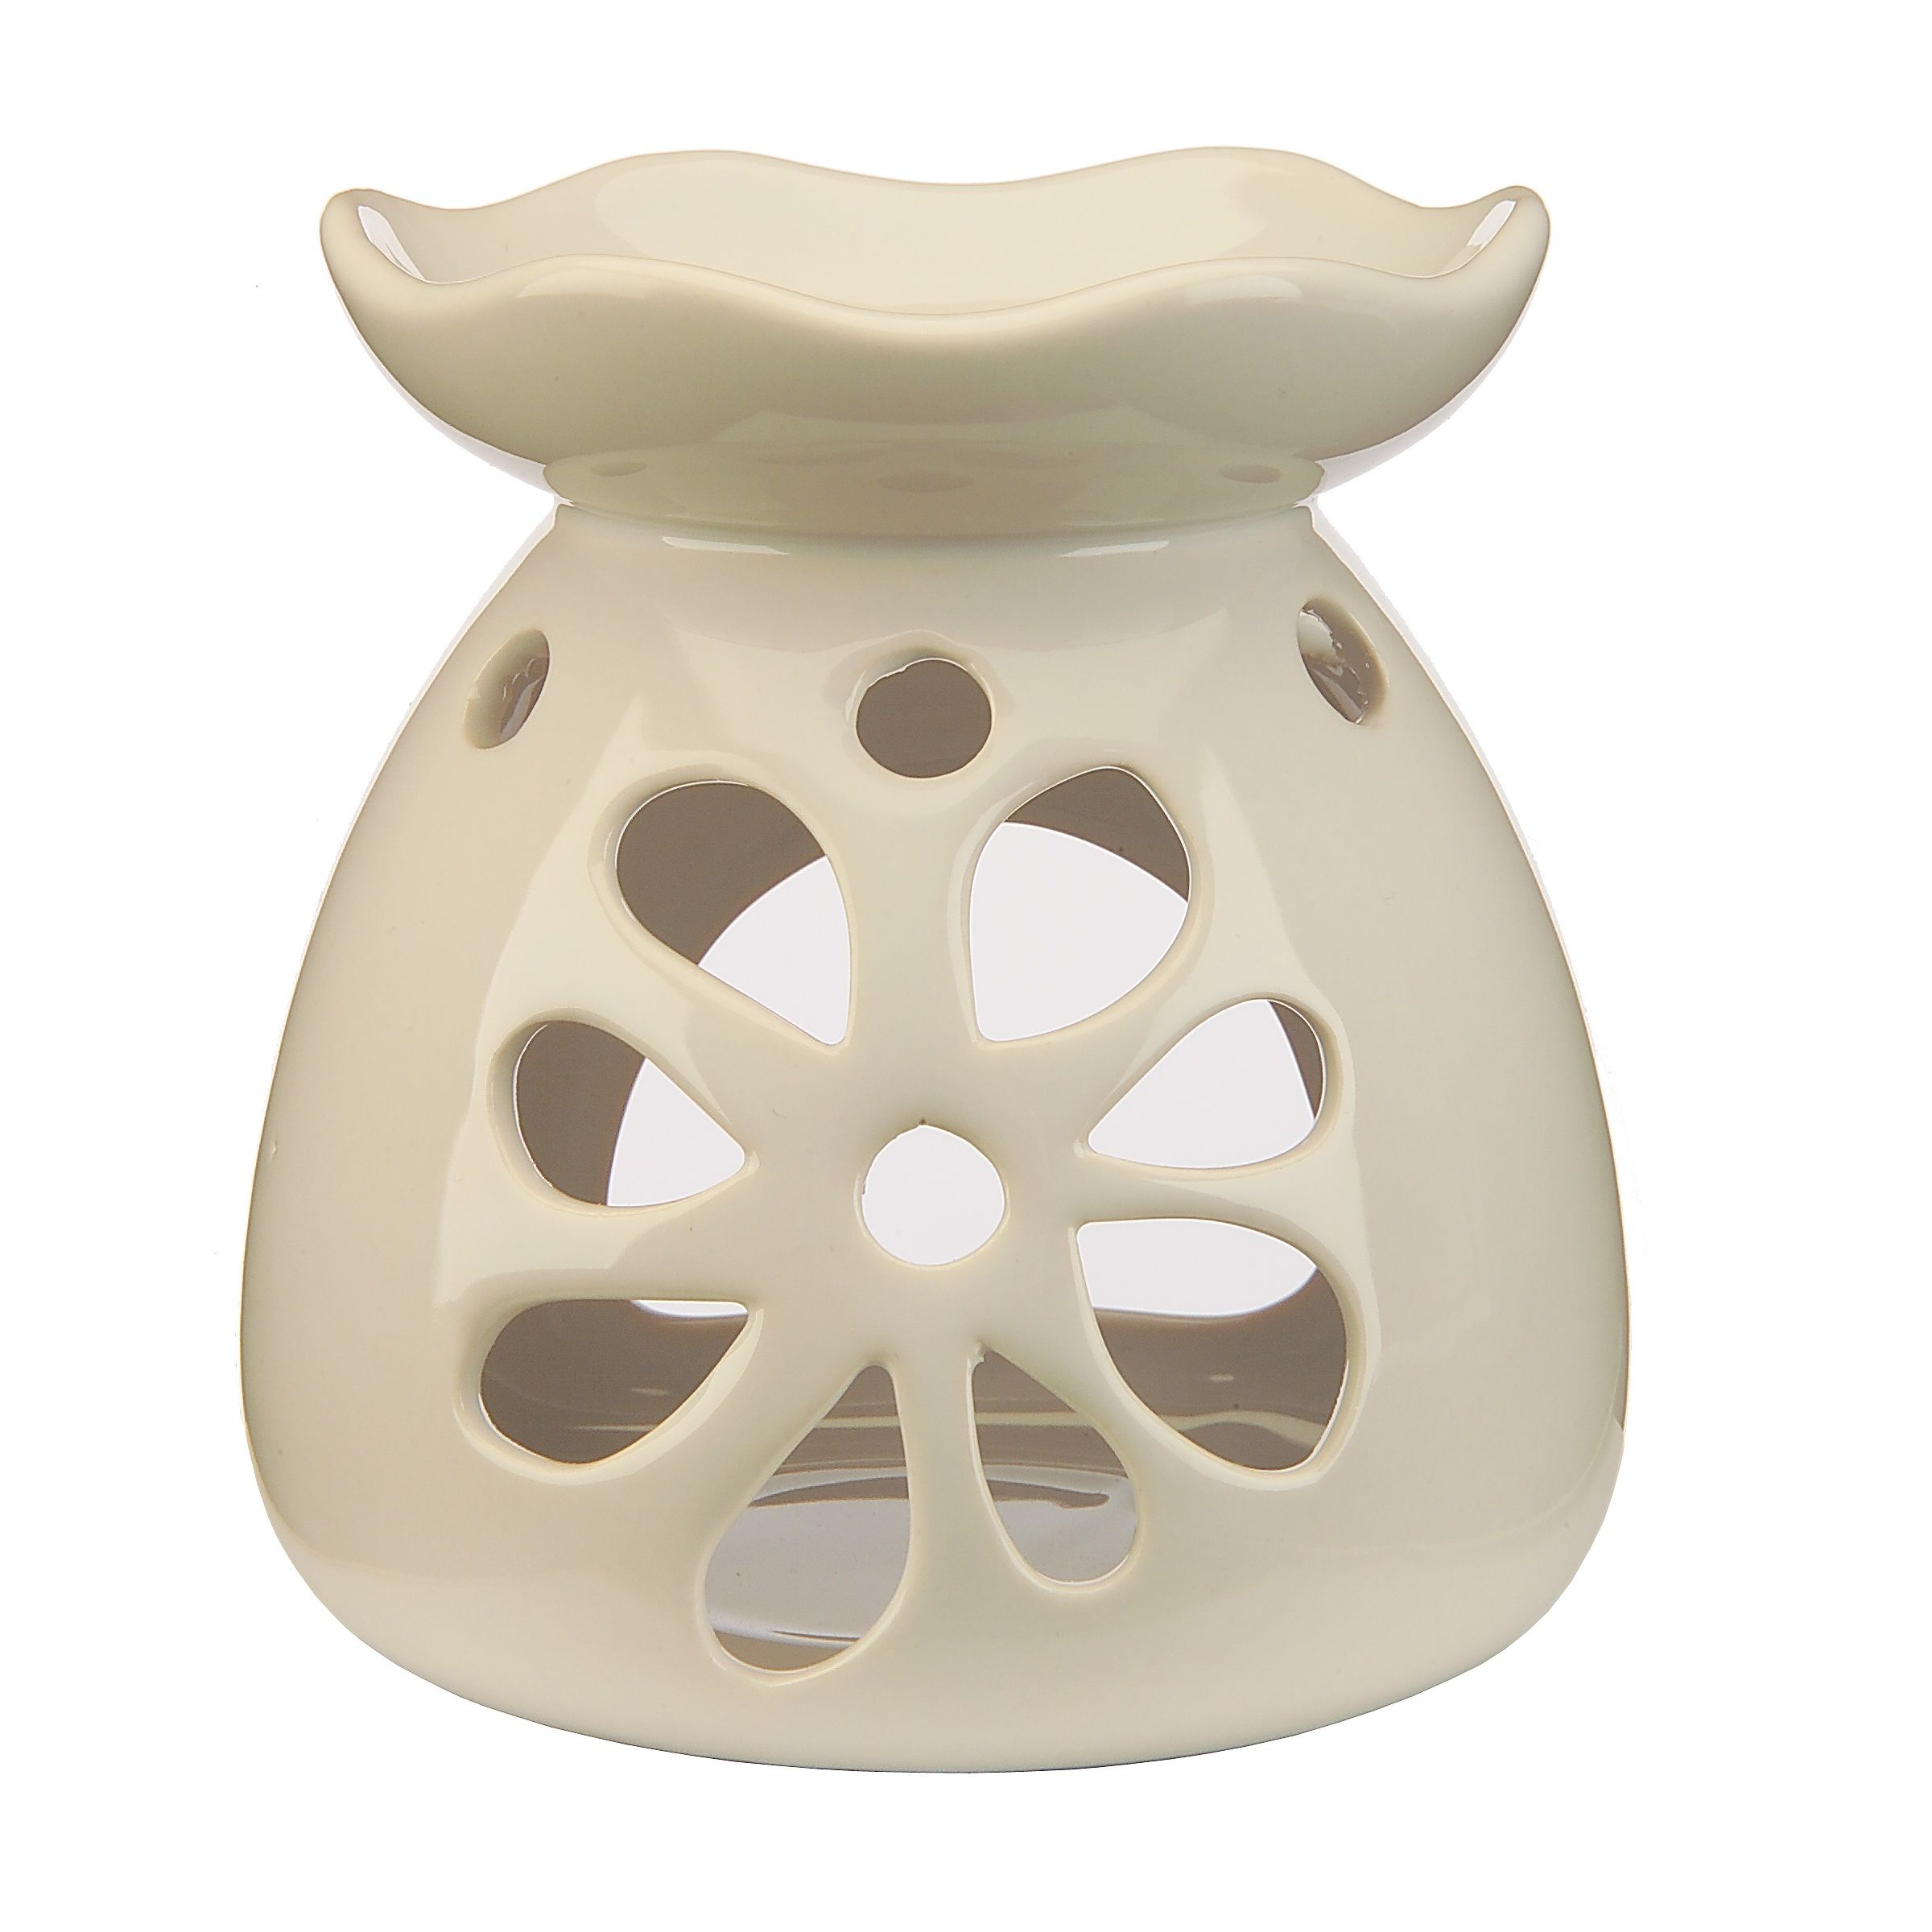 White Ceramic Flower Wax Melts Amp Oil Burner Wax Lyrical